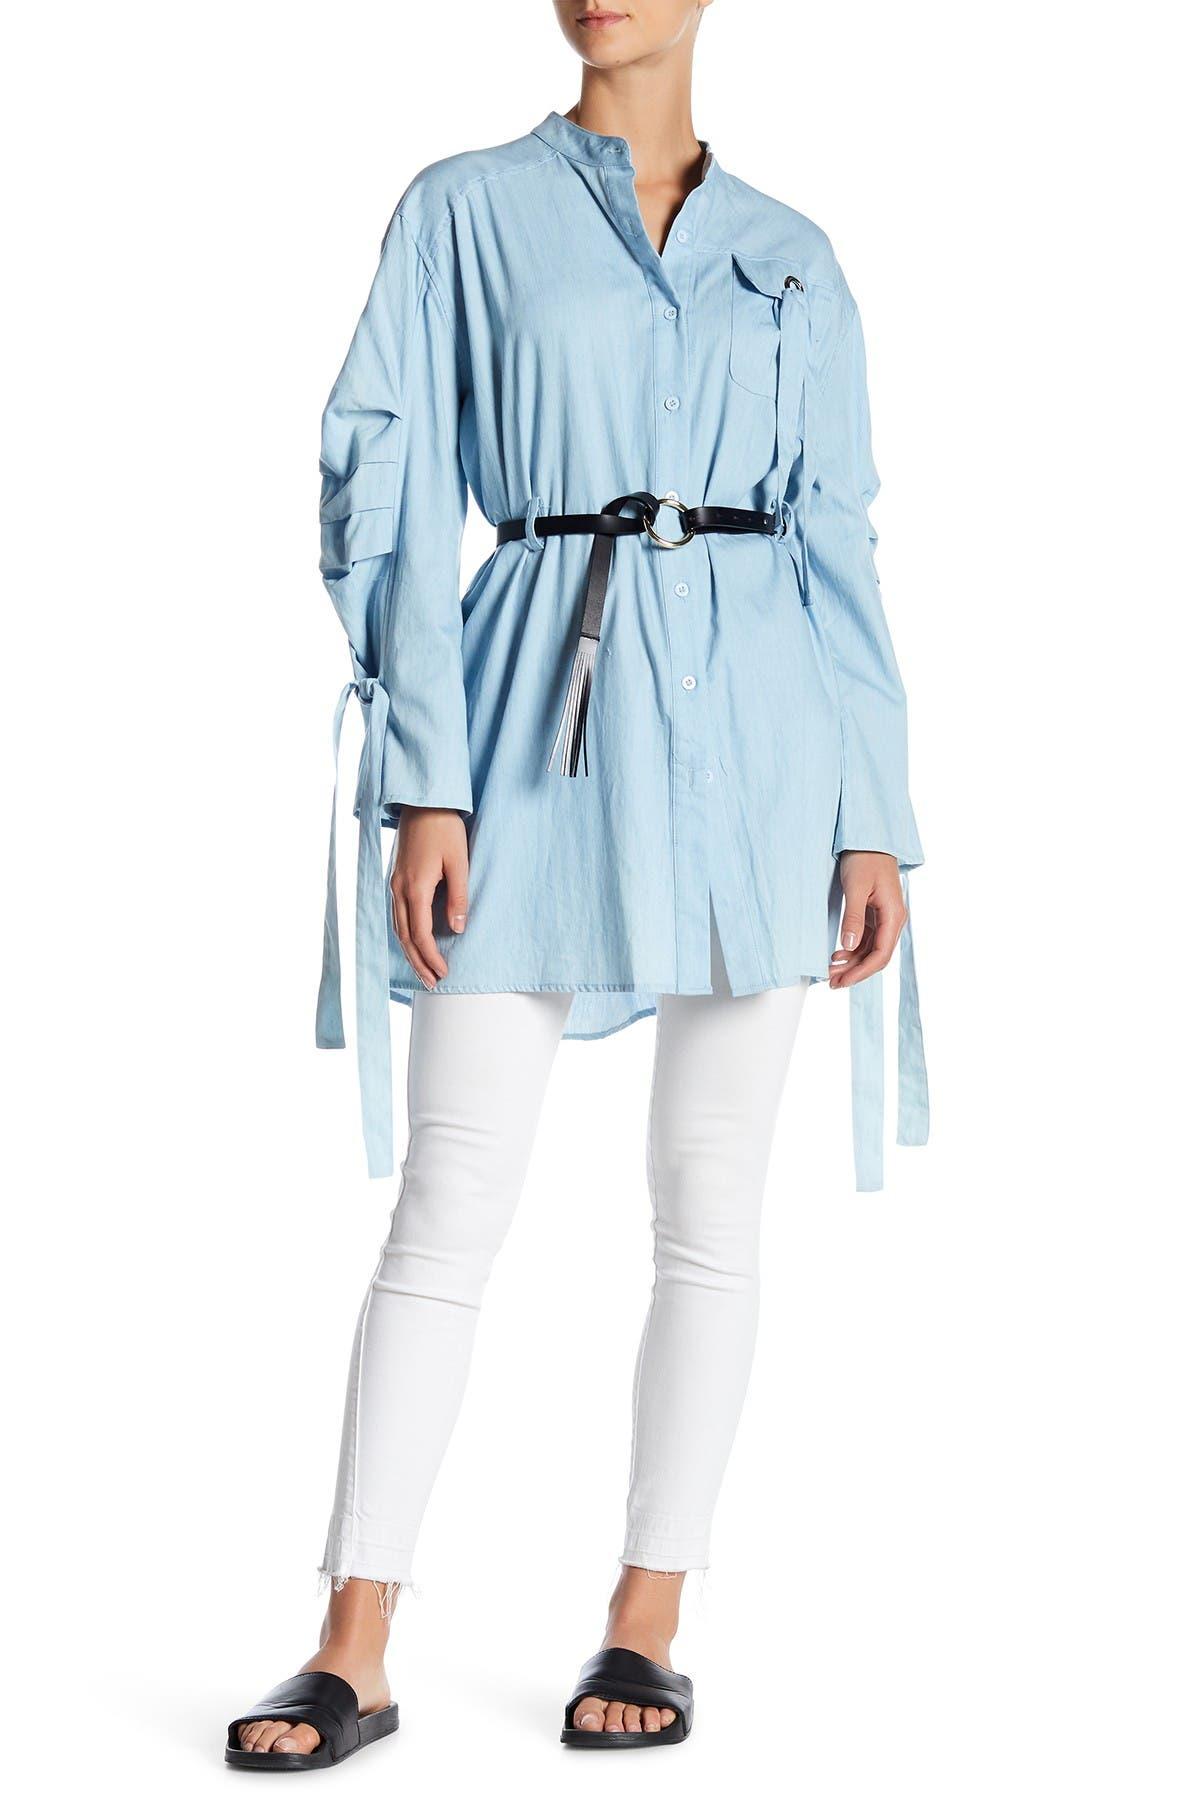 Image of TOV Mandarin Collar Cinched Waist Blouse